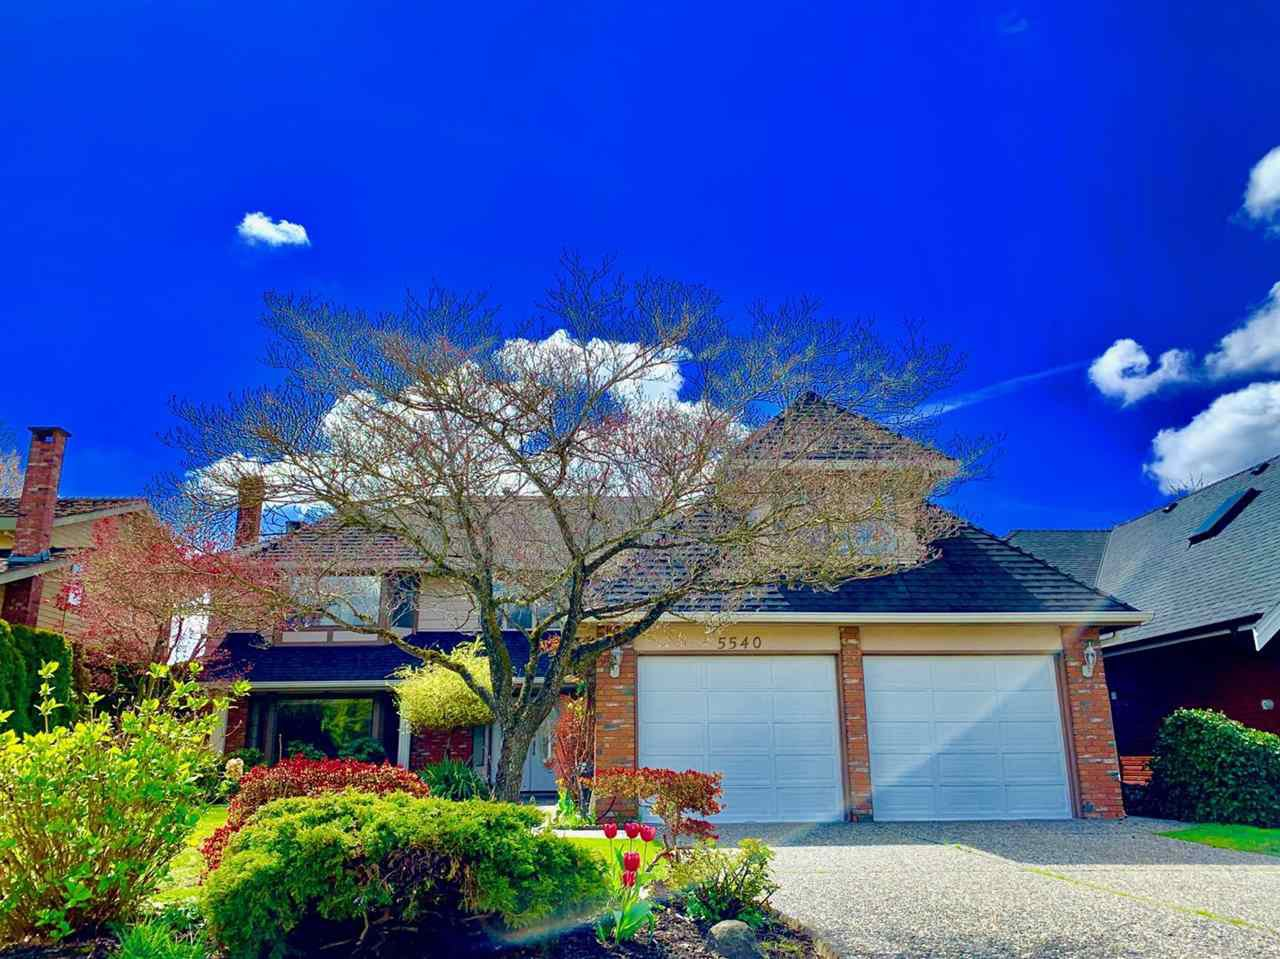 Main Photo: 5540 HOLT Avenue in Richmond: Riverdale RI House for sale : MLS®# R2358316